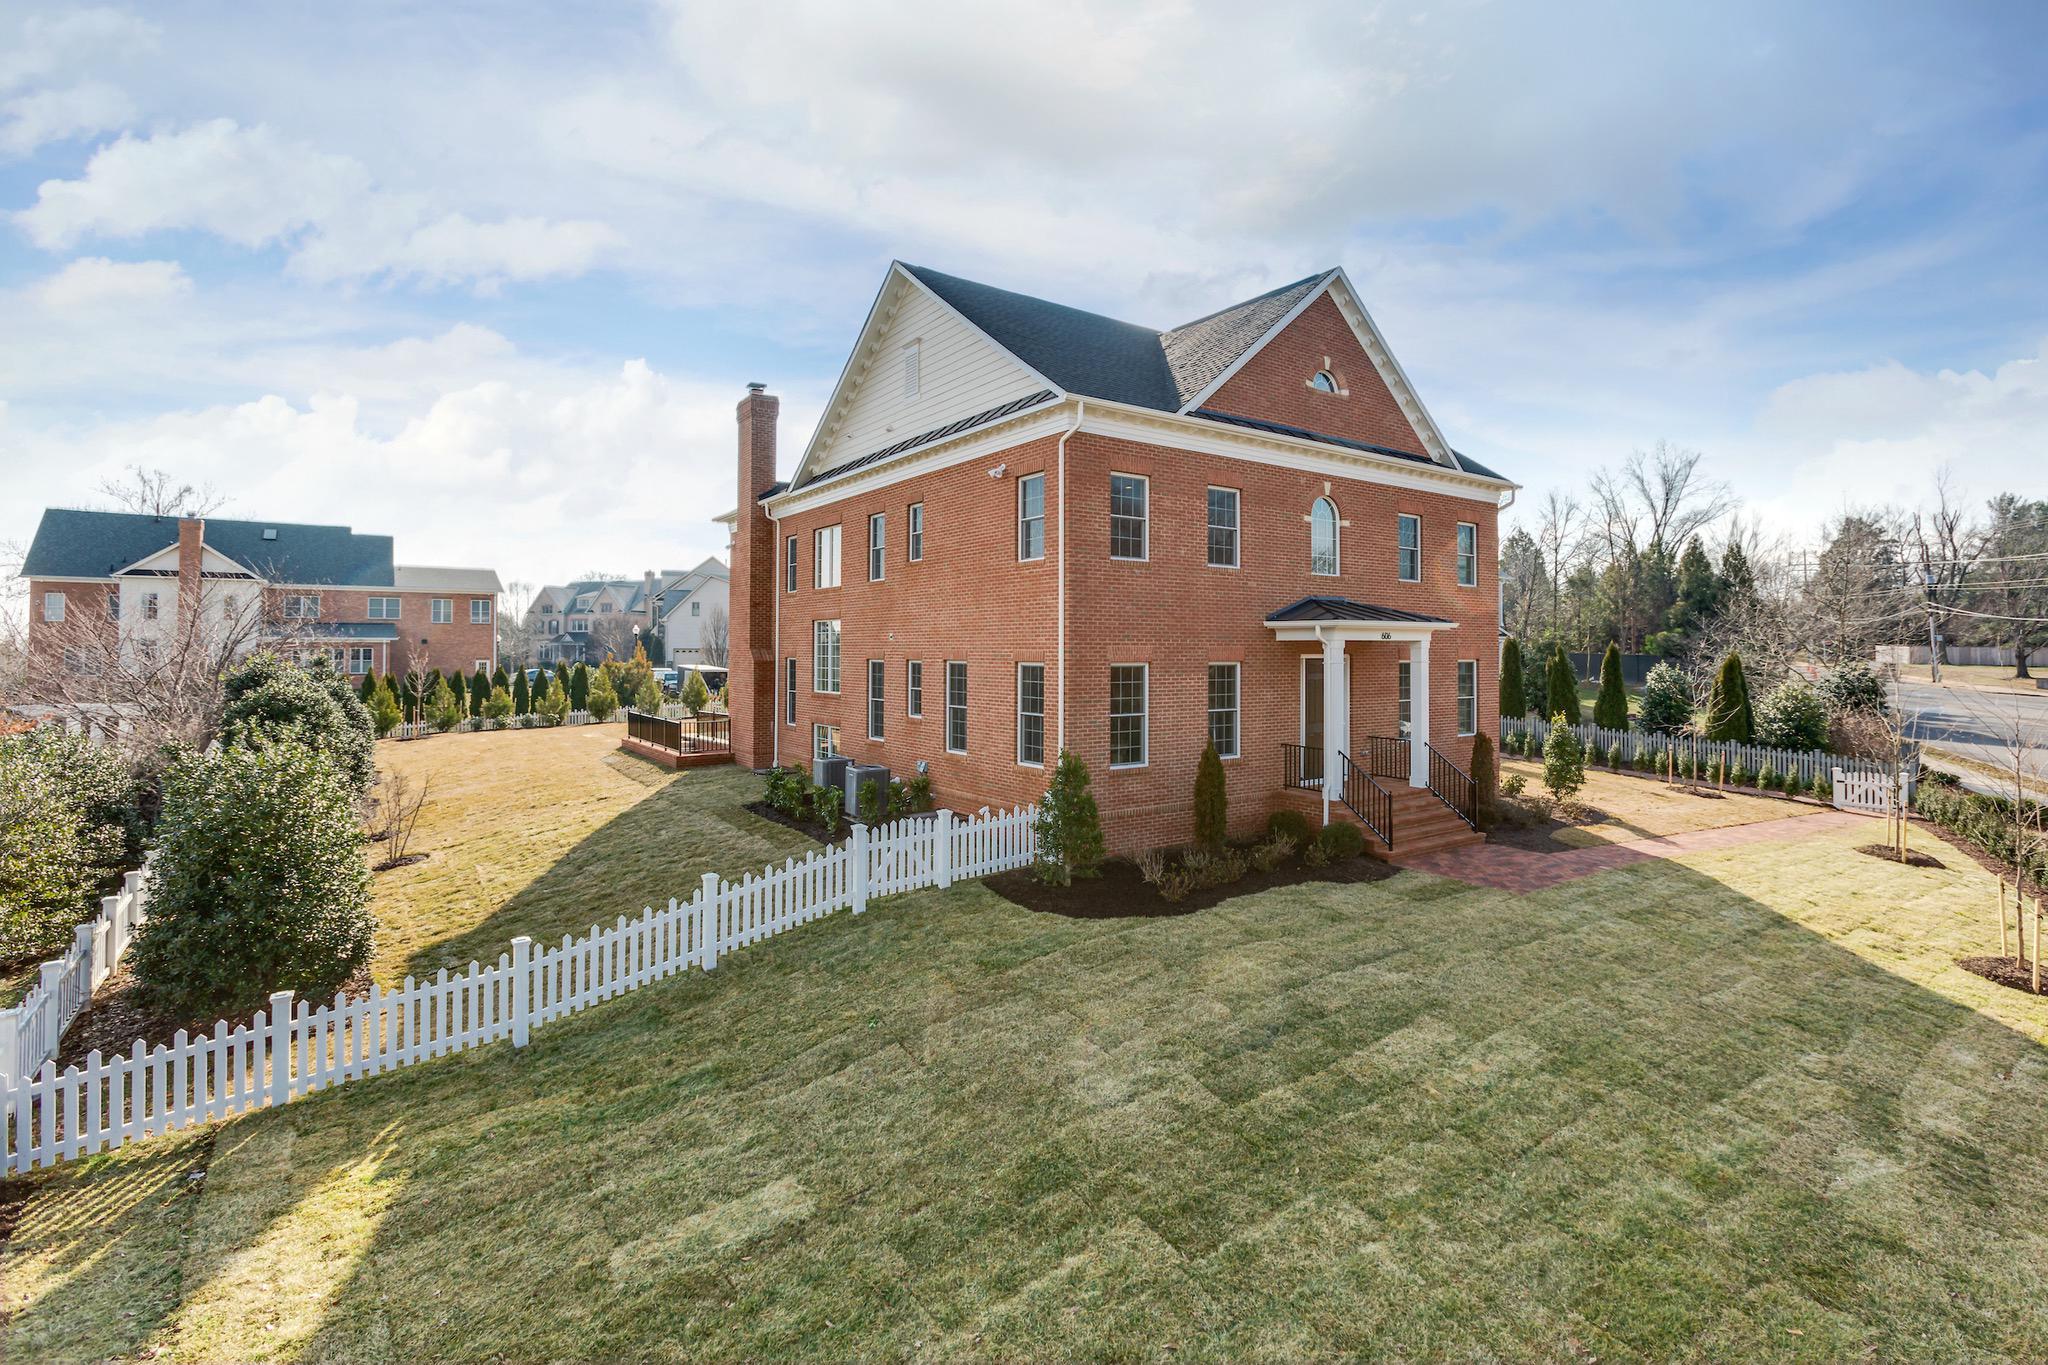 Single Family Home for Sale at 606 President Ford Lane 606 President Ford Lane Alexandria, Virginia 22302 United States